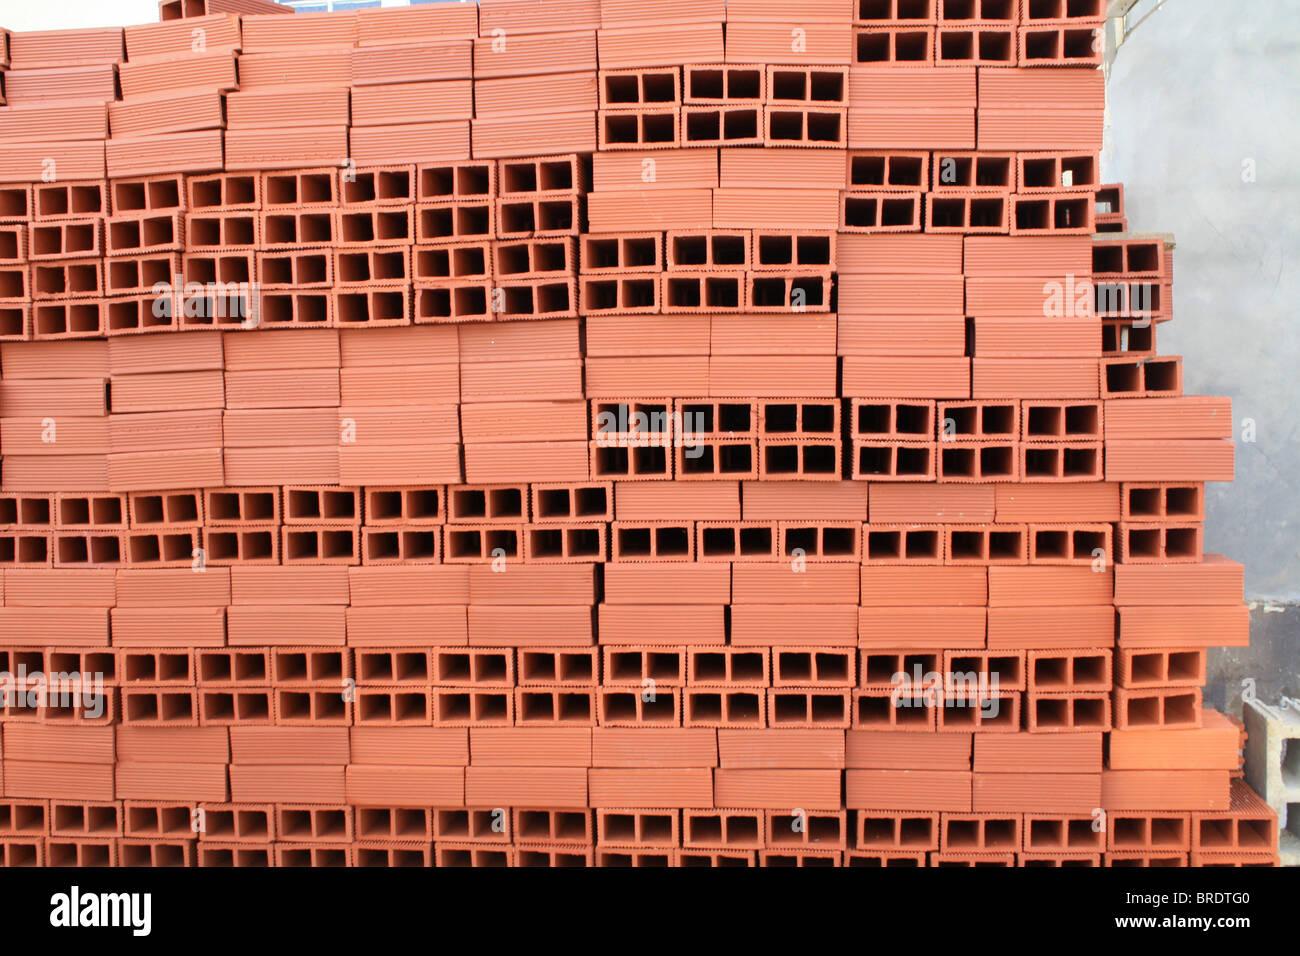 Construction Red Bricks. - Stock Image